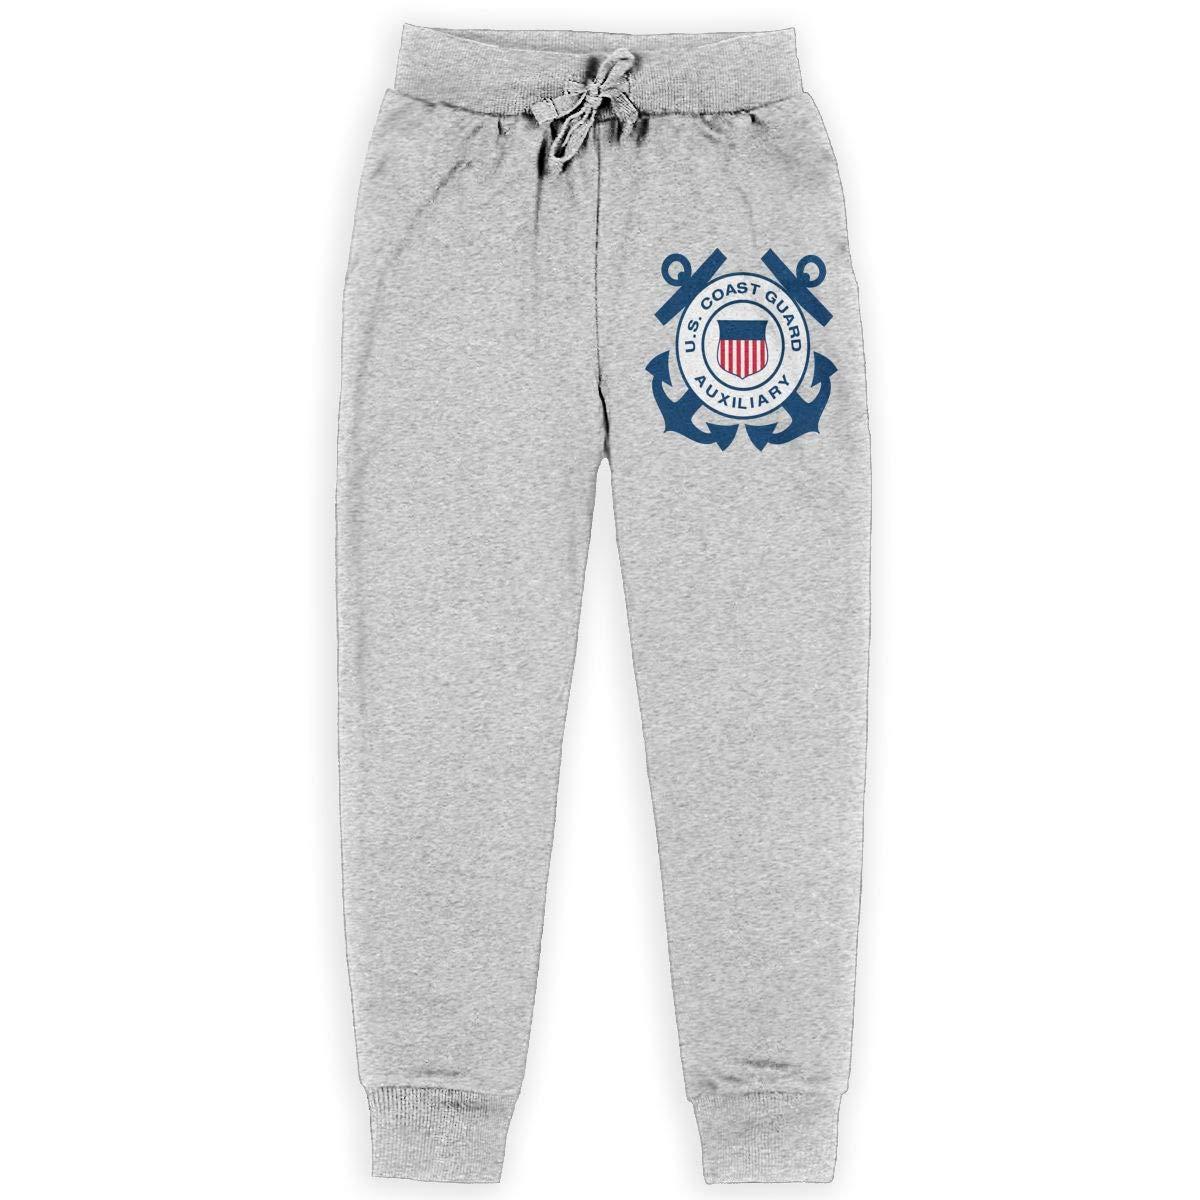 United States Coast Guard Auxiliary Boys Sweatpants Youth Fleece Pants Boys Fleece Pants Gray